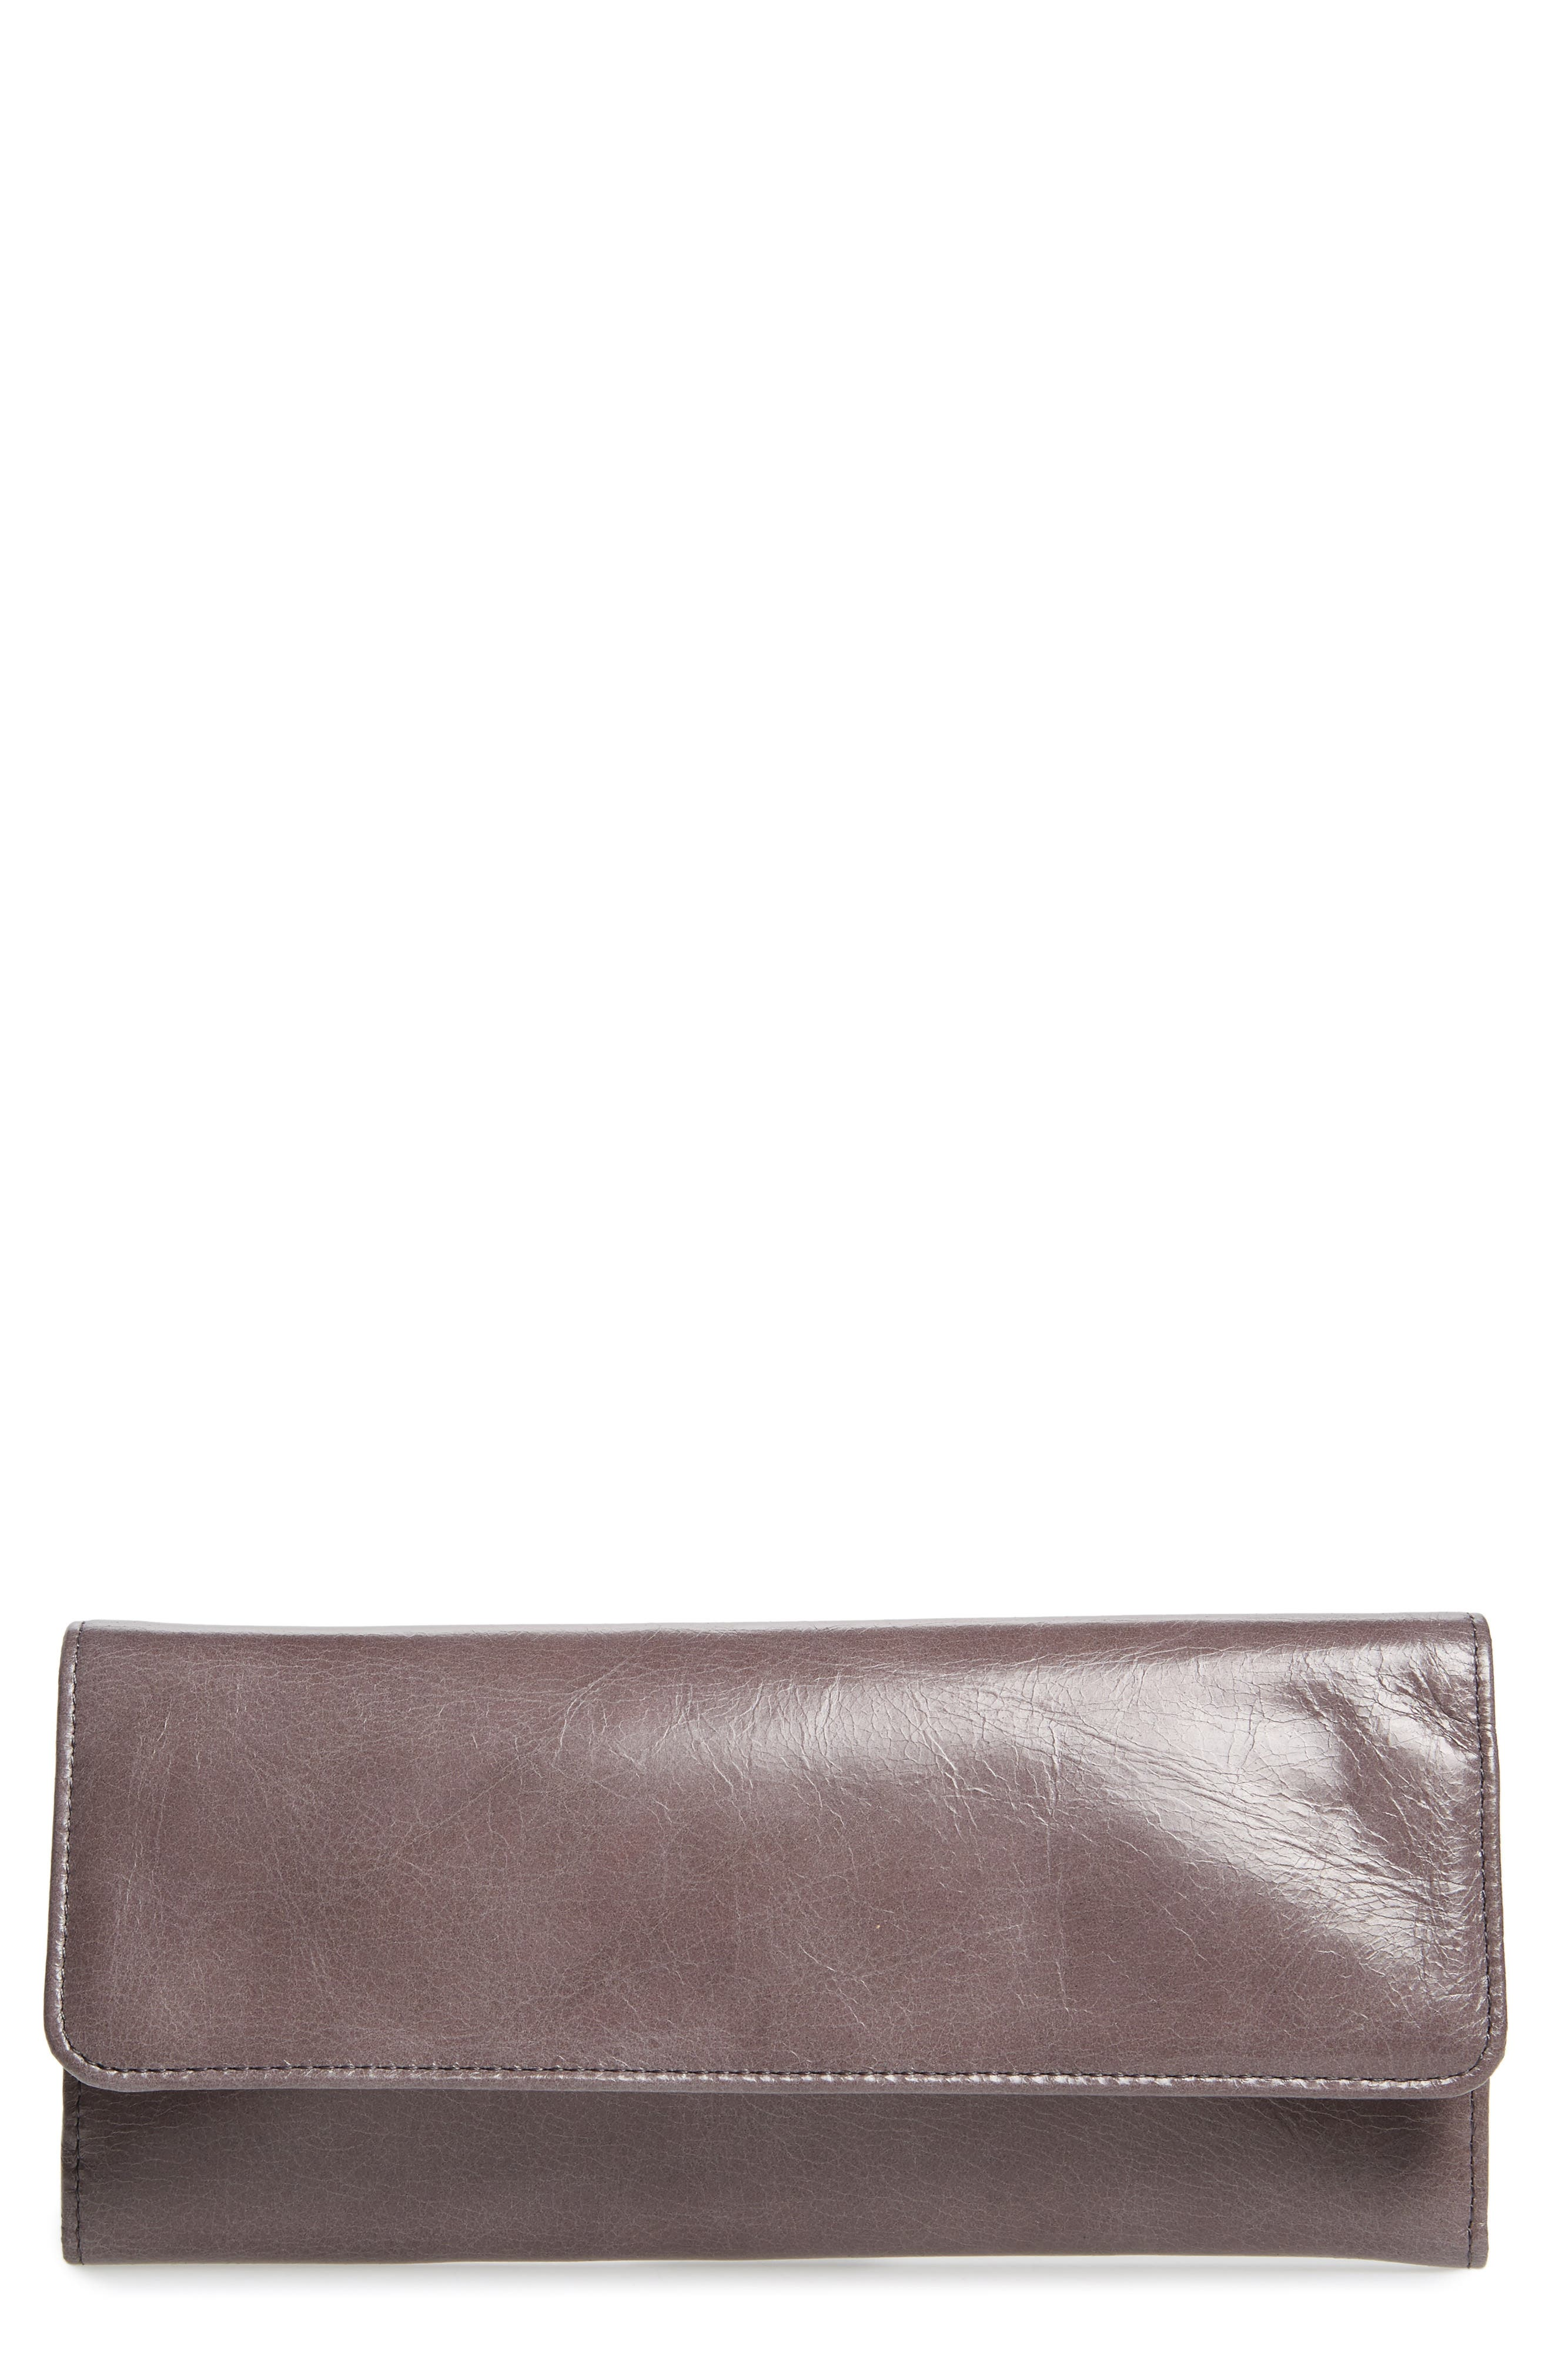 'Sadie' Leather Wallet,                             Main thumbnail 17, color,